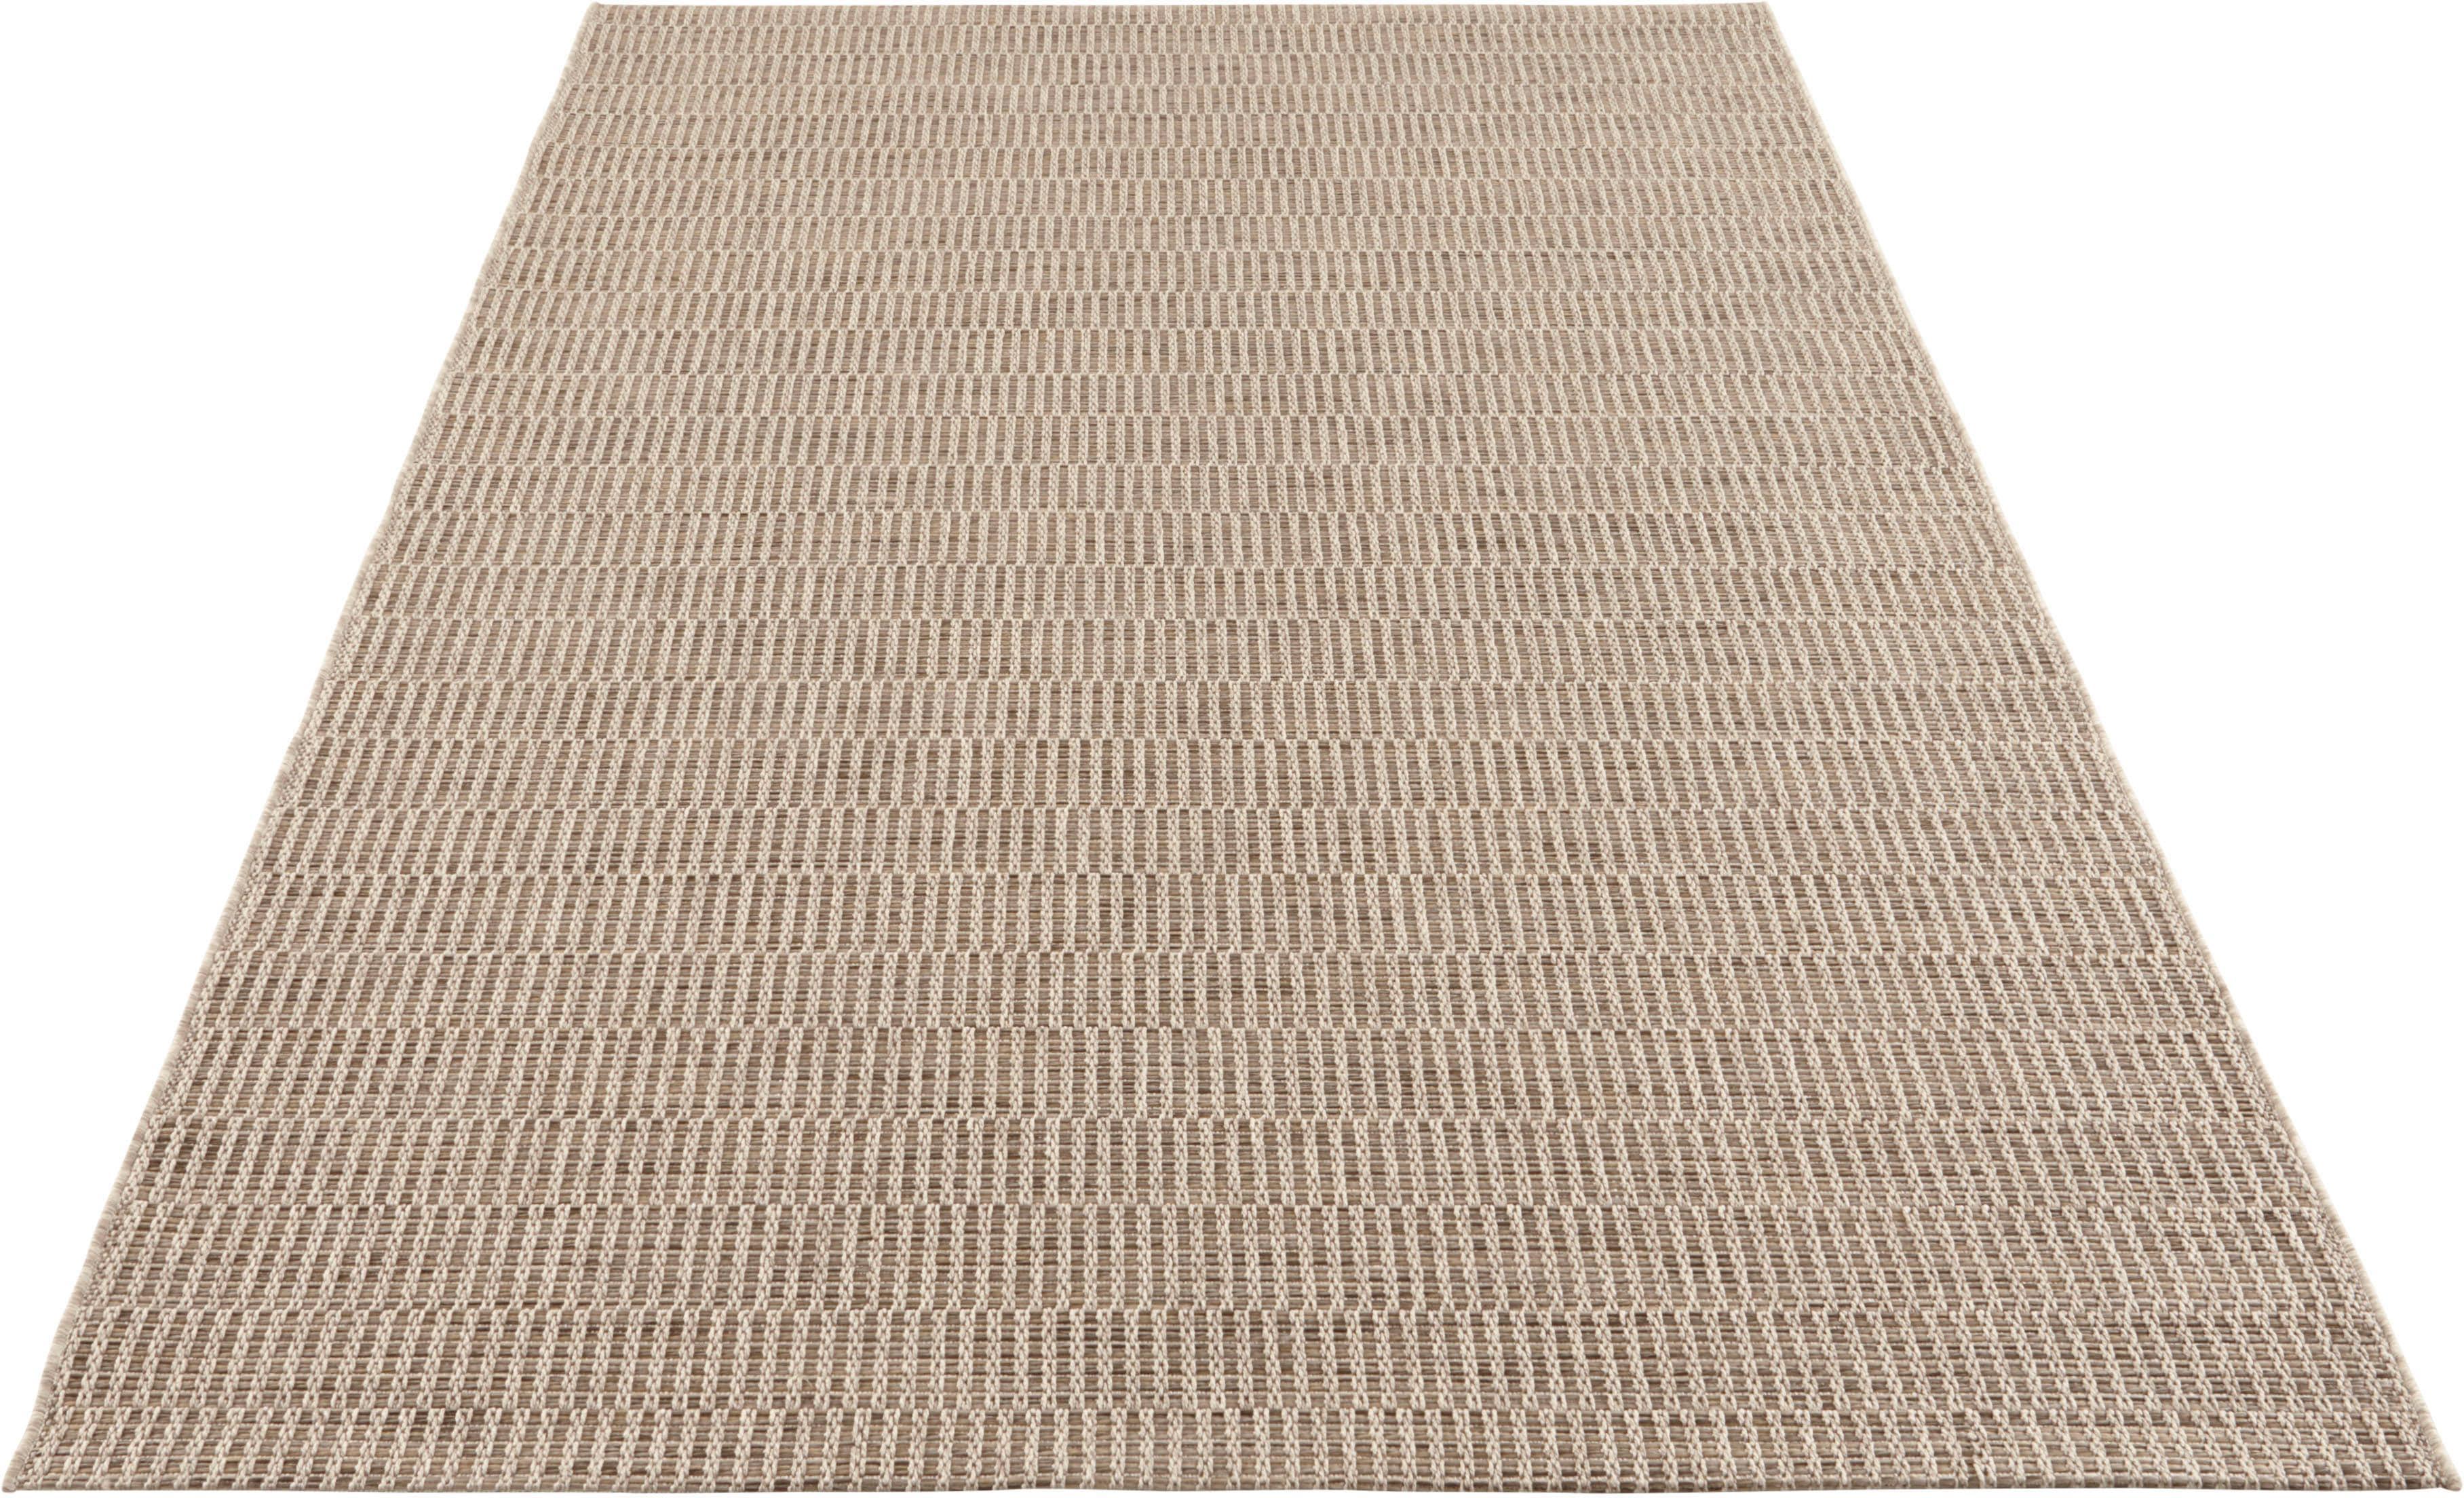 Teppich Dreux ELLE Decor rechteckig Höhe 8 mm maschinell gewebt